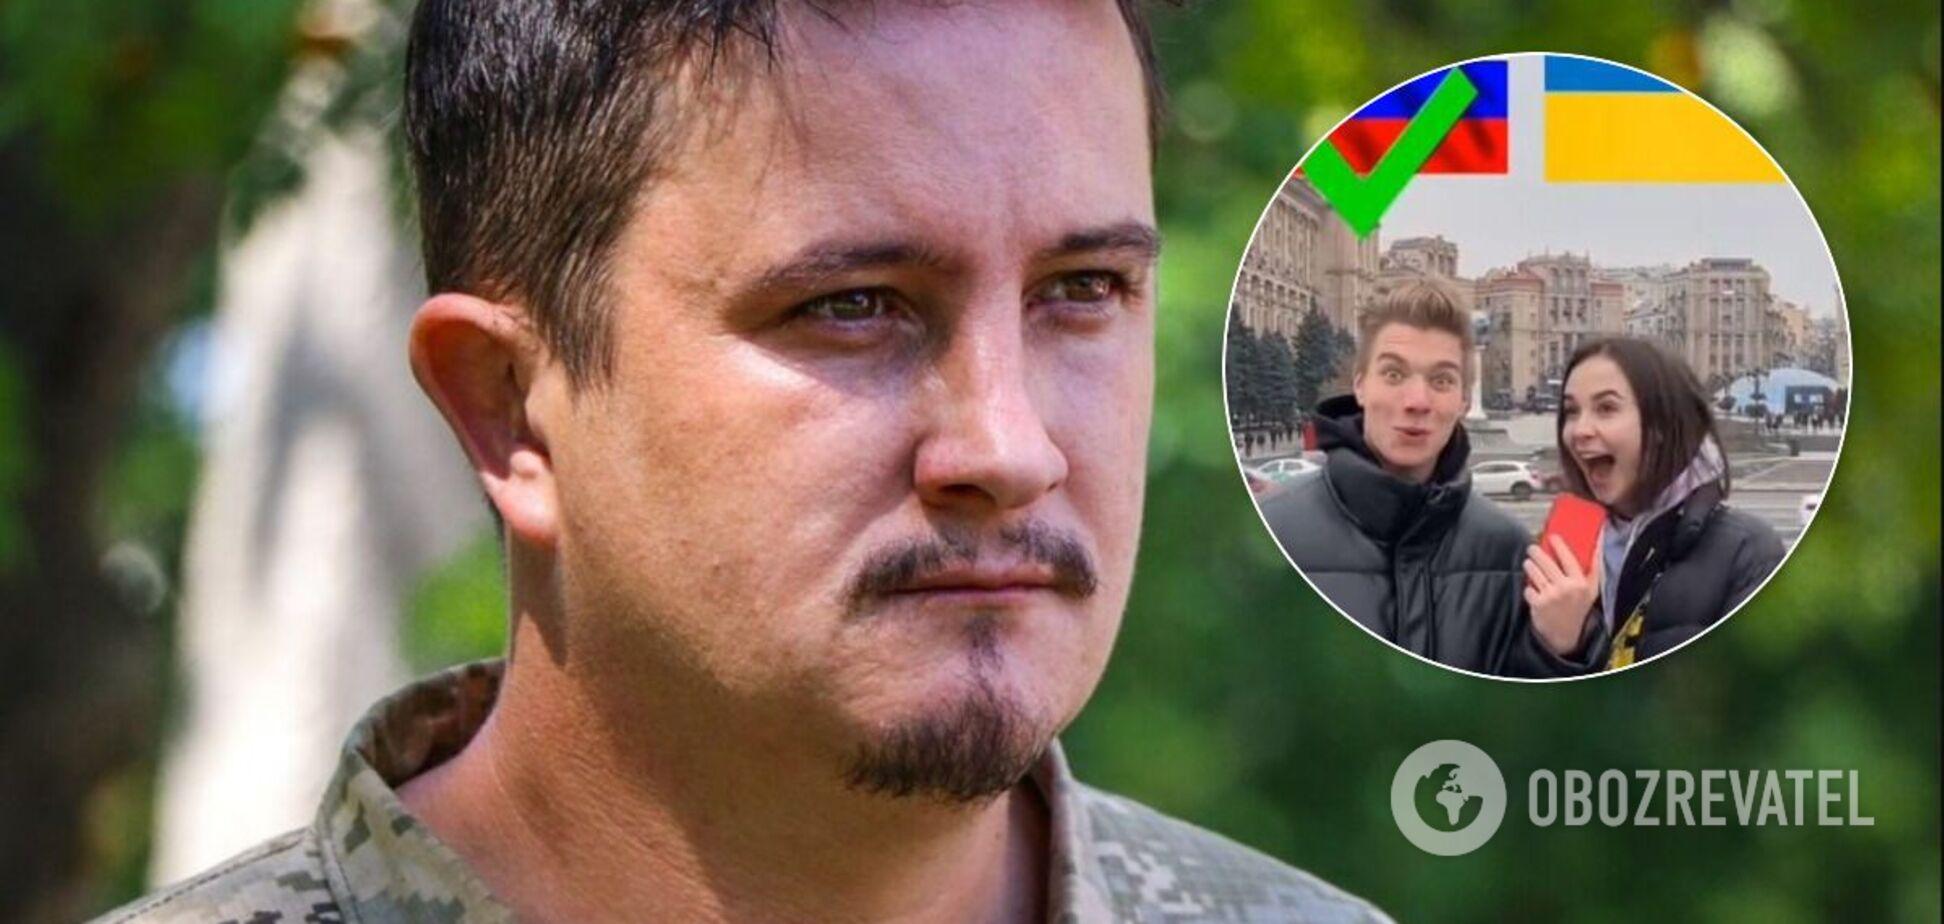 Блогерша di.rubens решила судиться со Штефаном